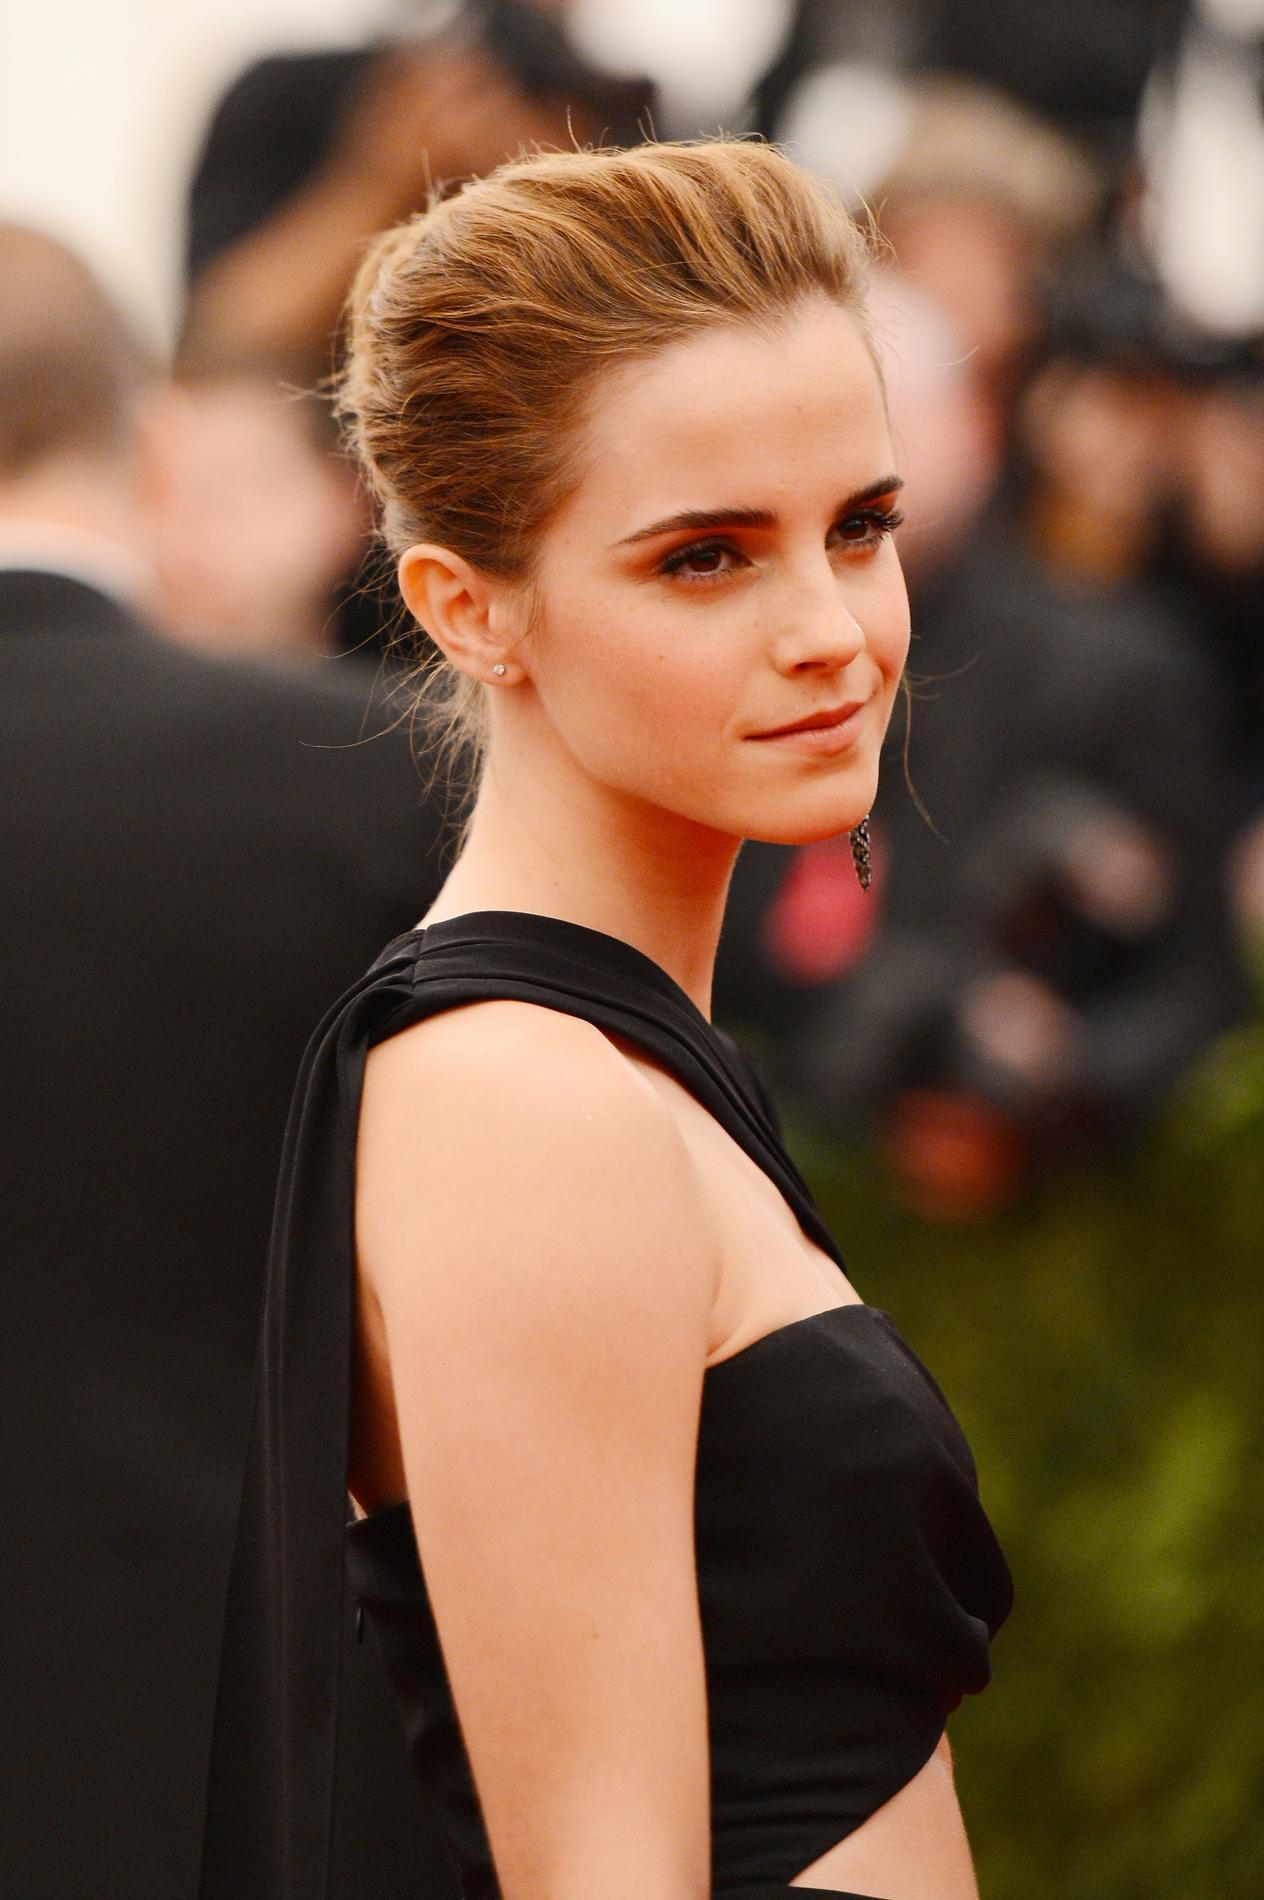 Les plus belles coiffures d'Emma Watson - les cheveux Sonia Rykiel Keira Knightley